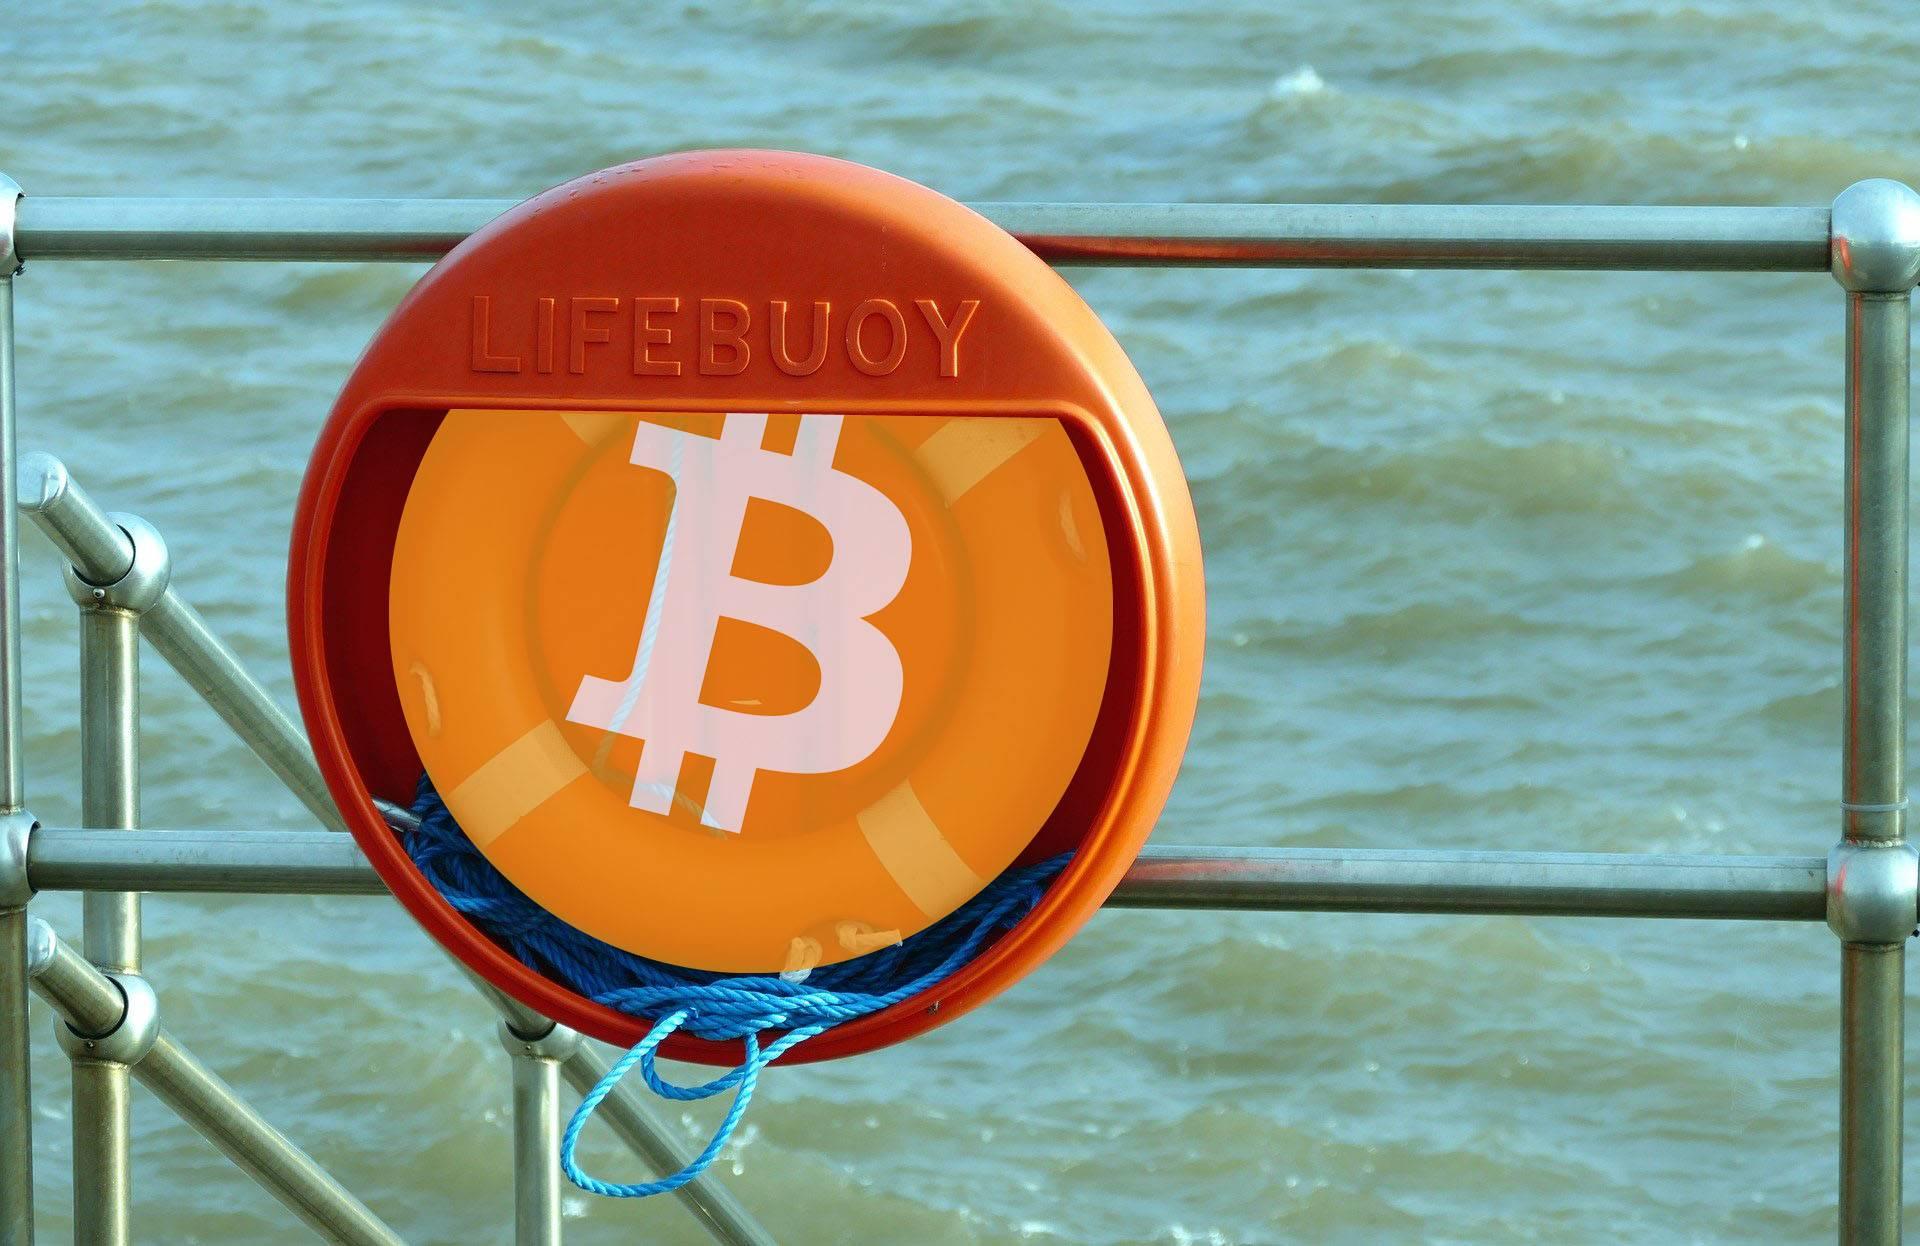 Bitcoin $BTC valeur refuge